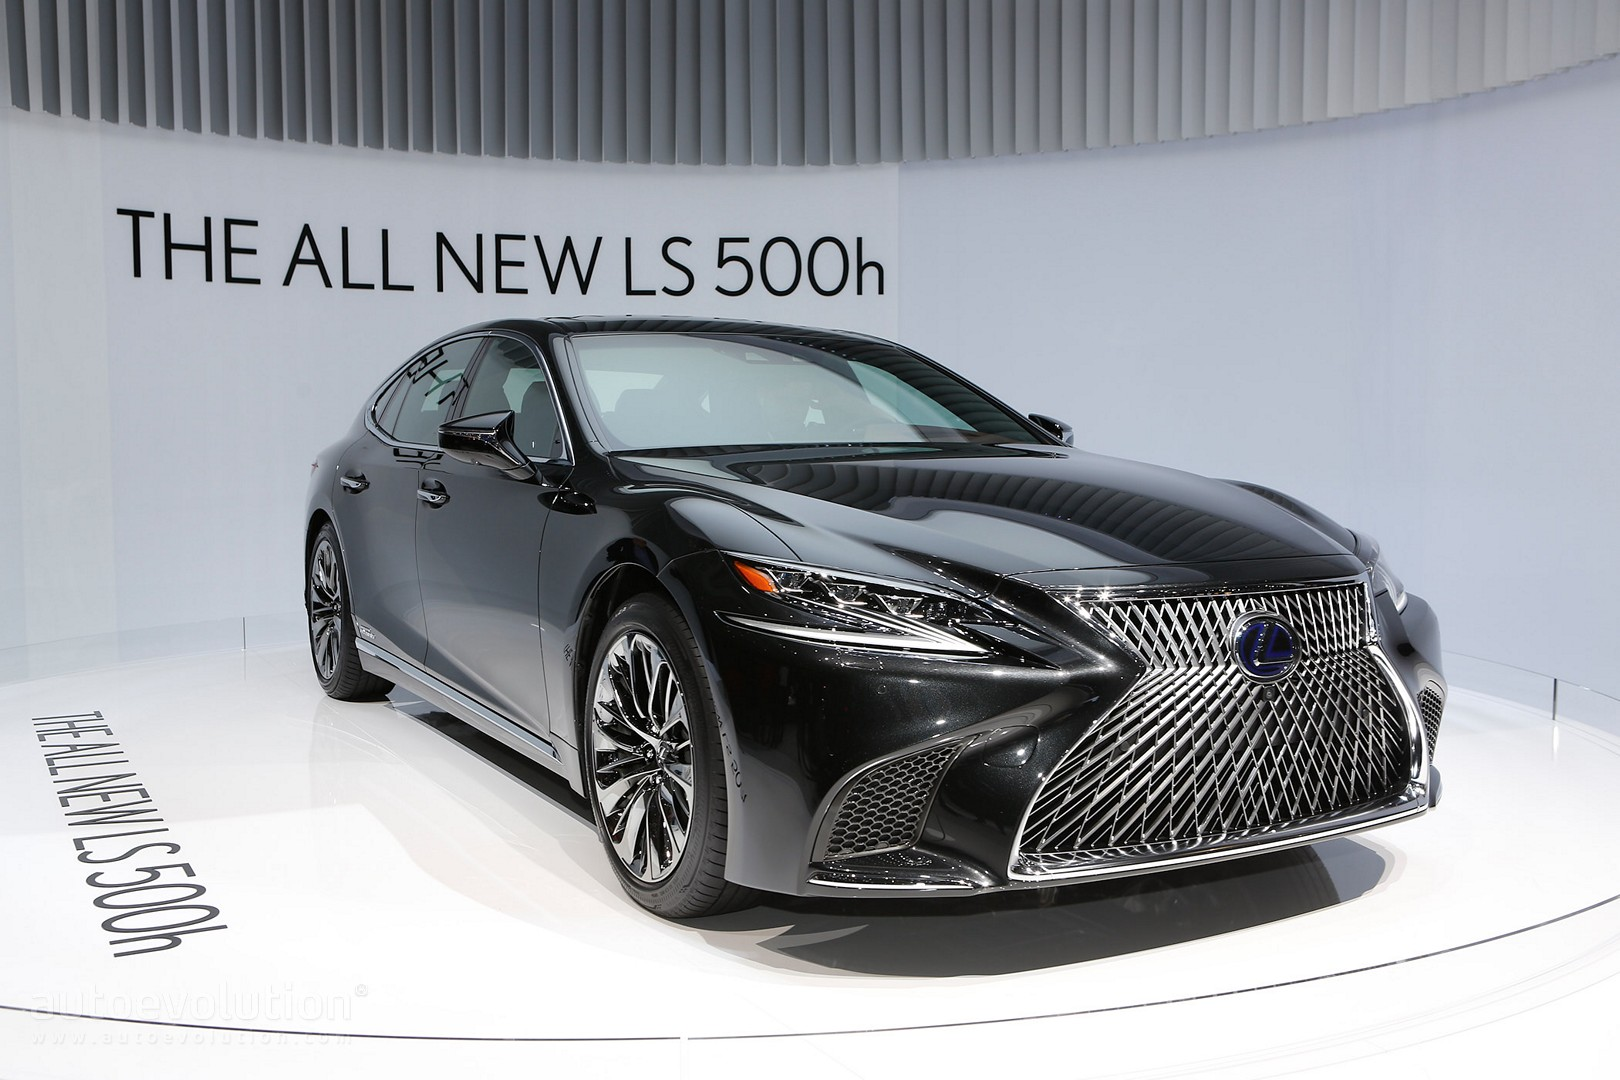 https://s1.cdn.autoevolution.com/images/news/the-all-new-2018-lexus-ls-500h-gets-revealed-in-geneva-116010_1.jpg